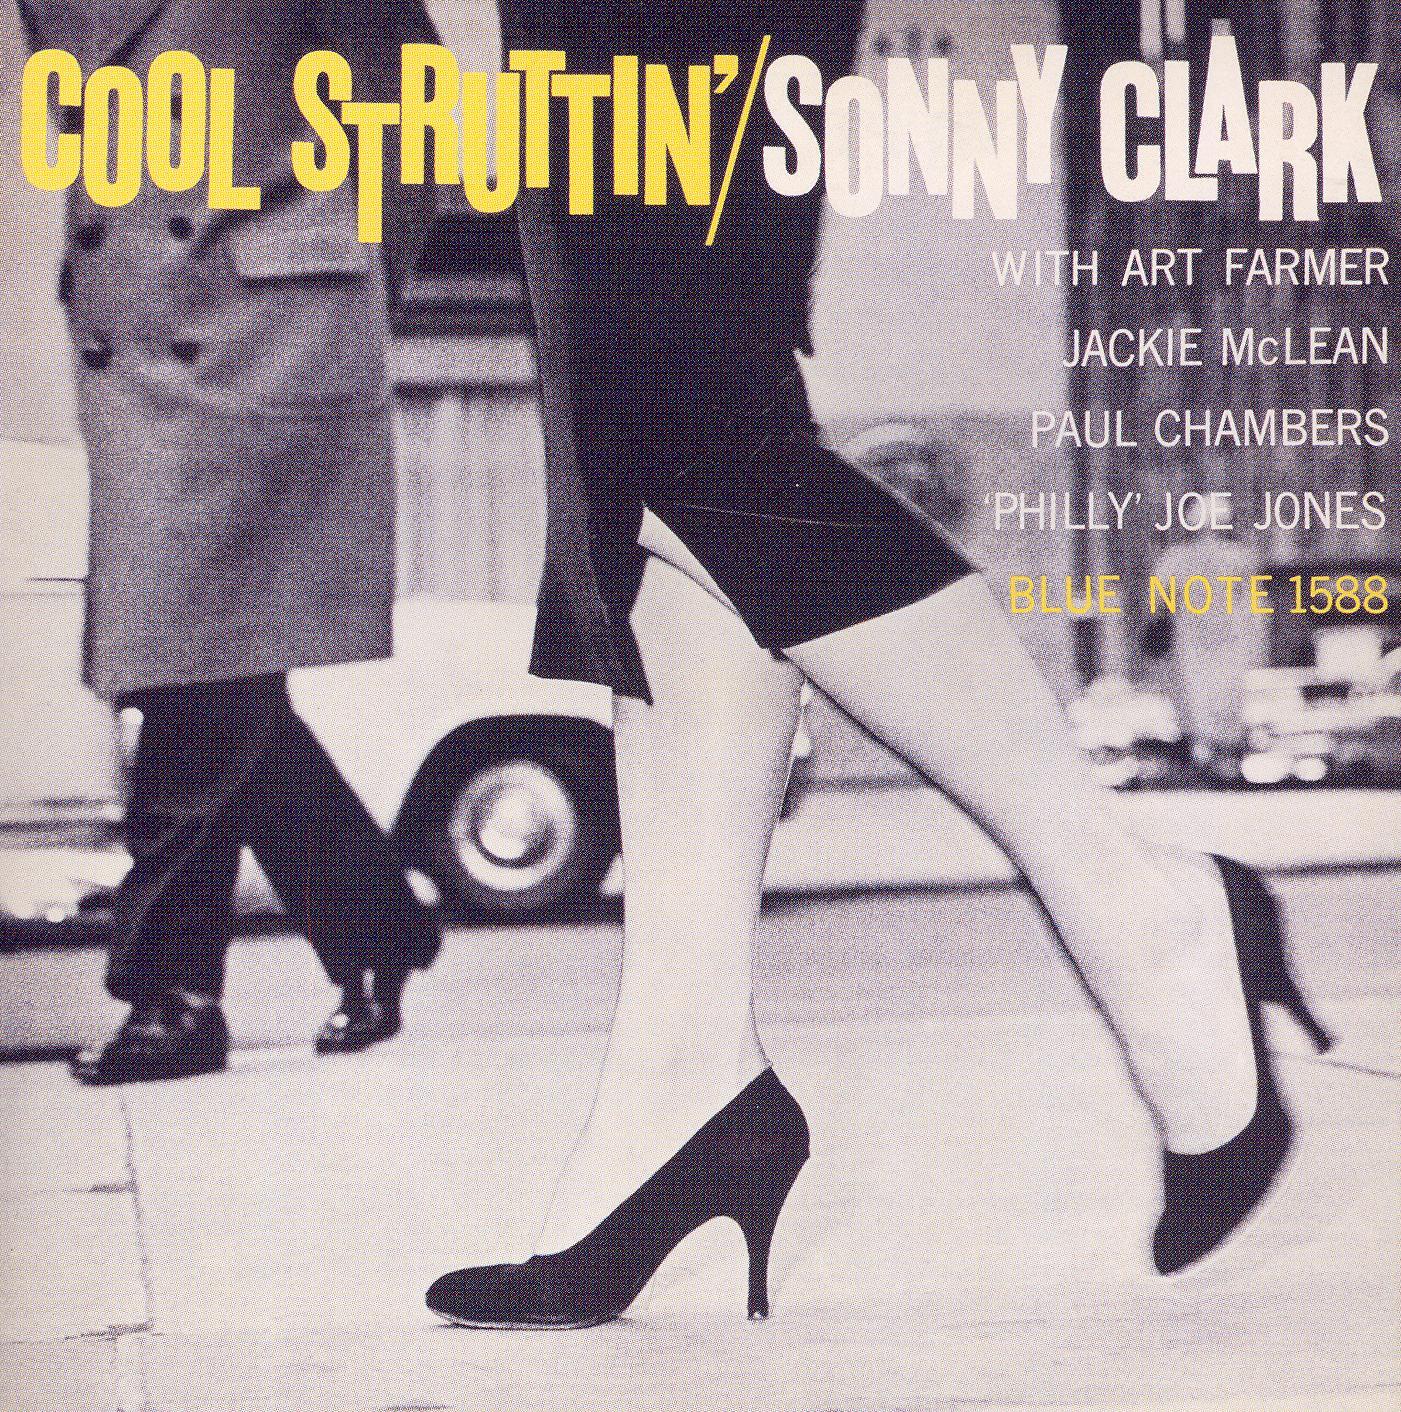 Sonny Clark: Cool Struttin